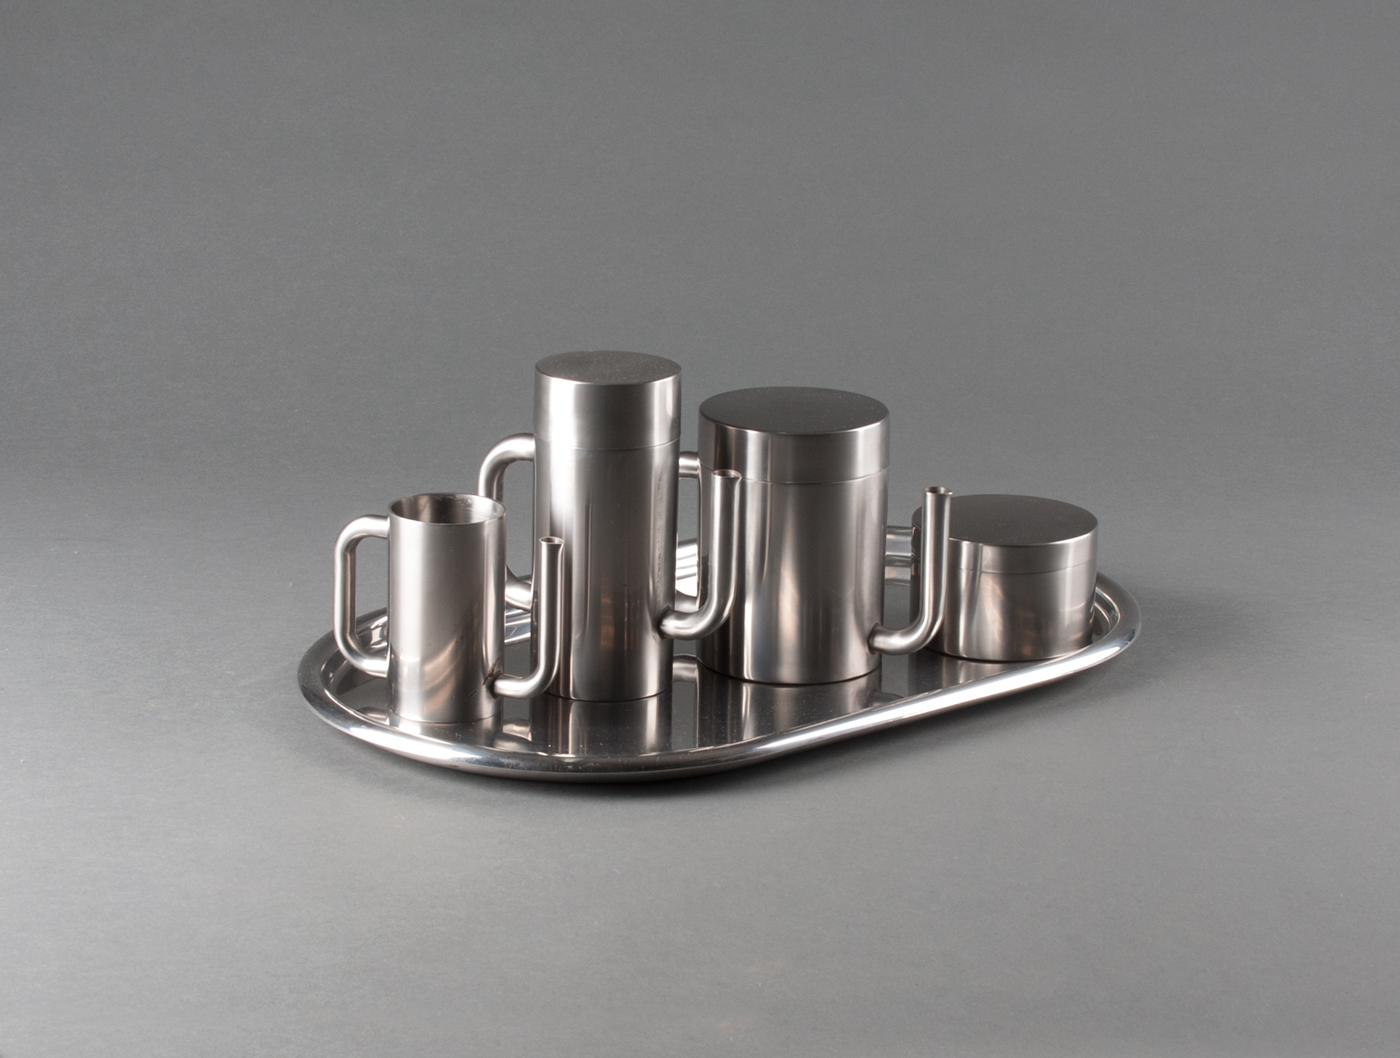 service th et caf moderne soubrier louer accessoires argenterie xxe. Black Bedroom Furniture Sets. Home Design Ideas